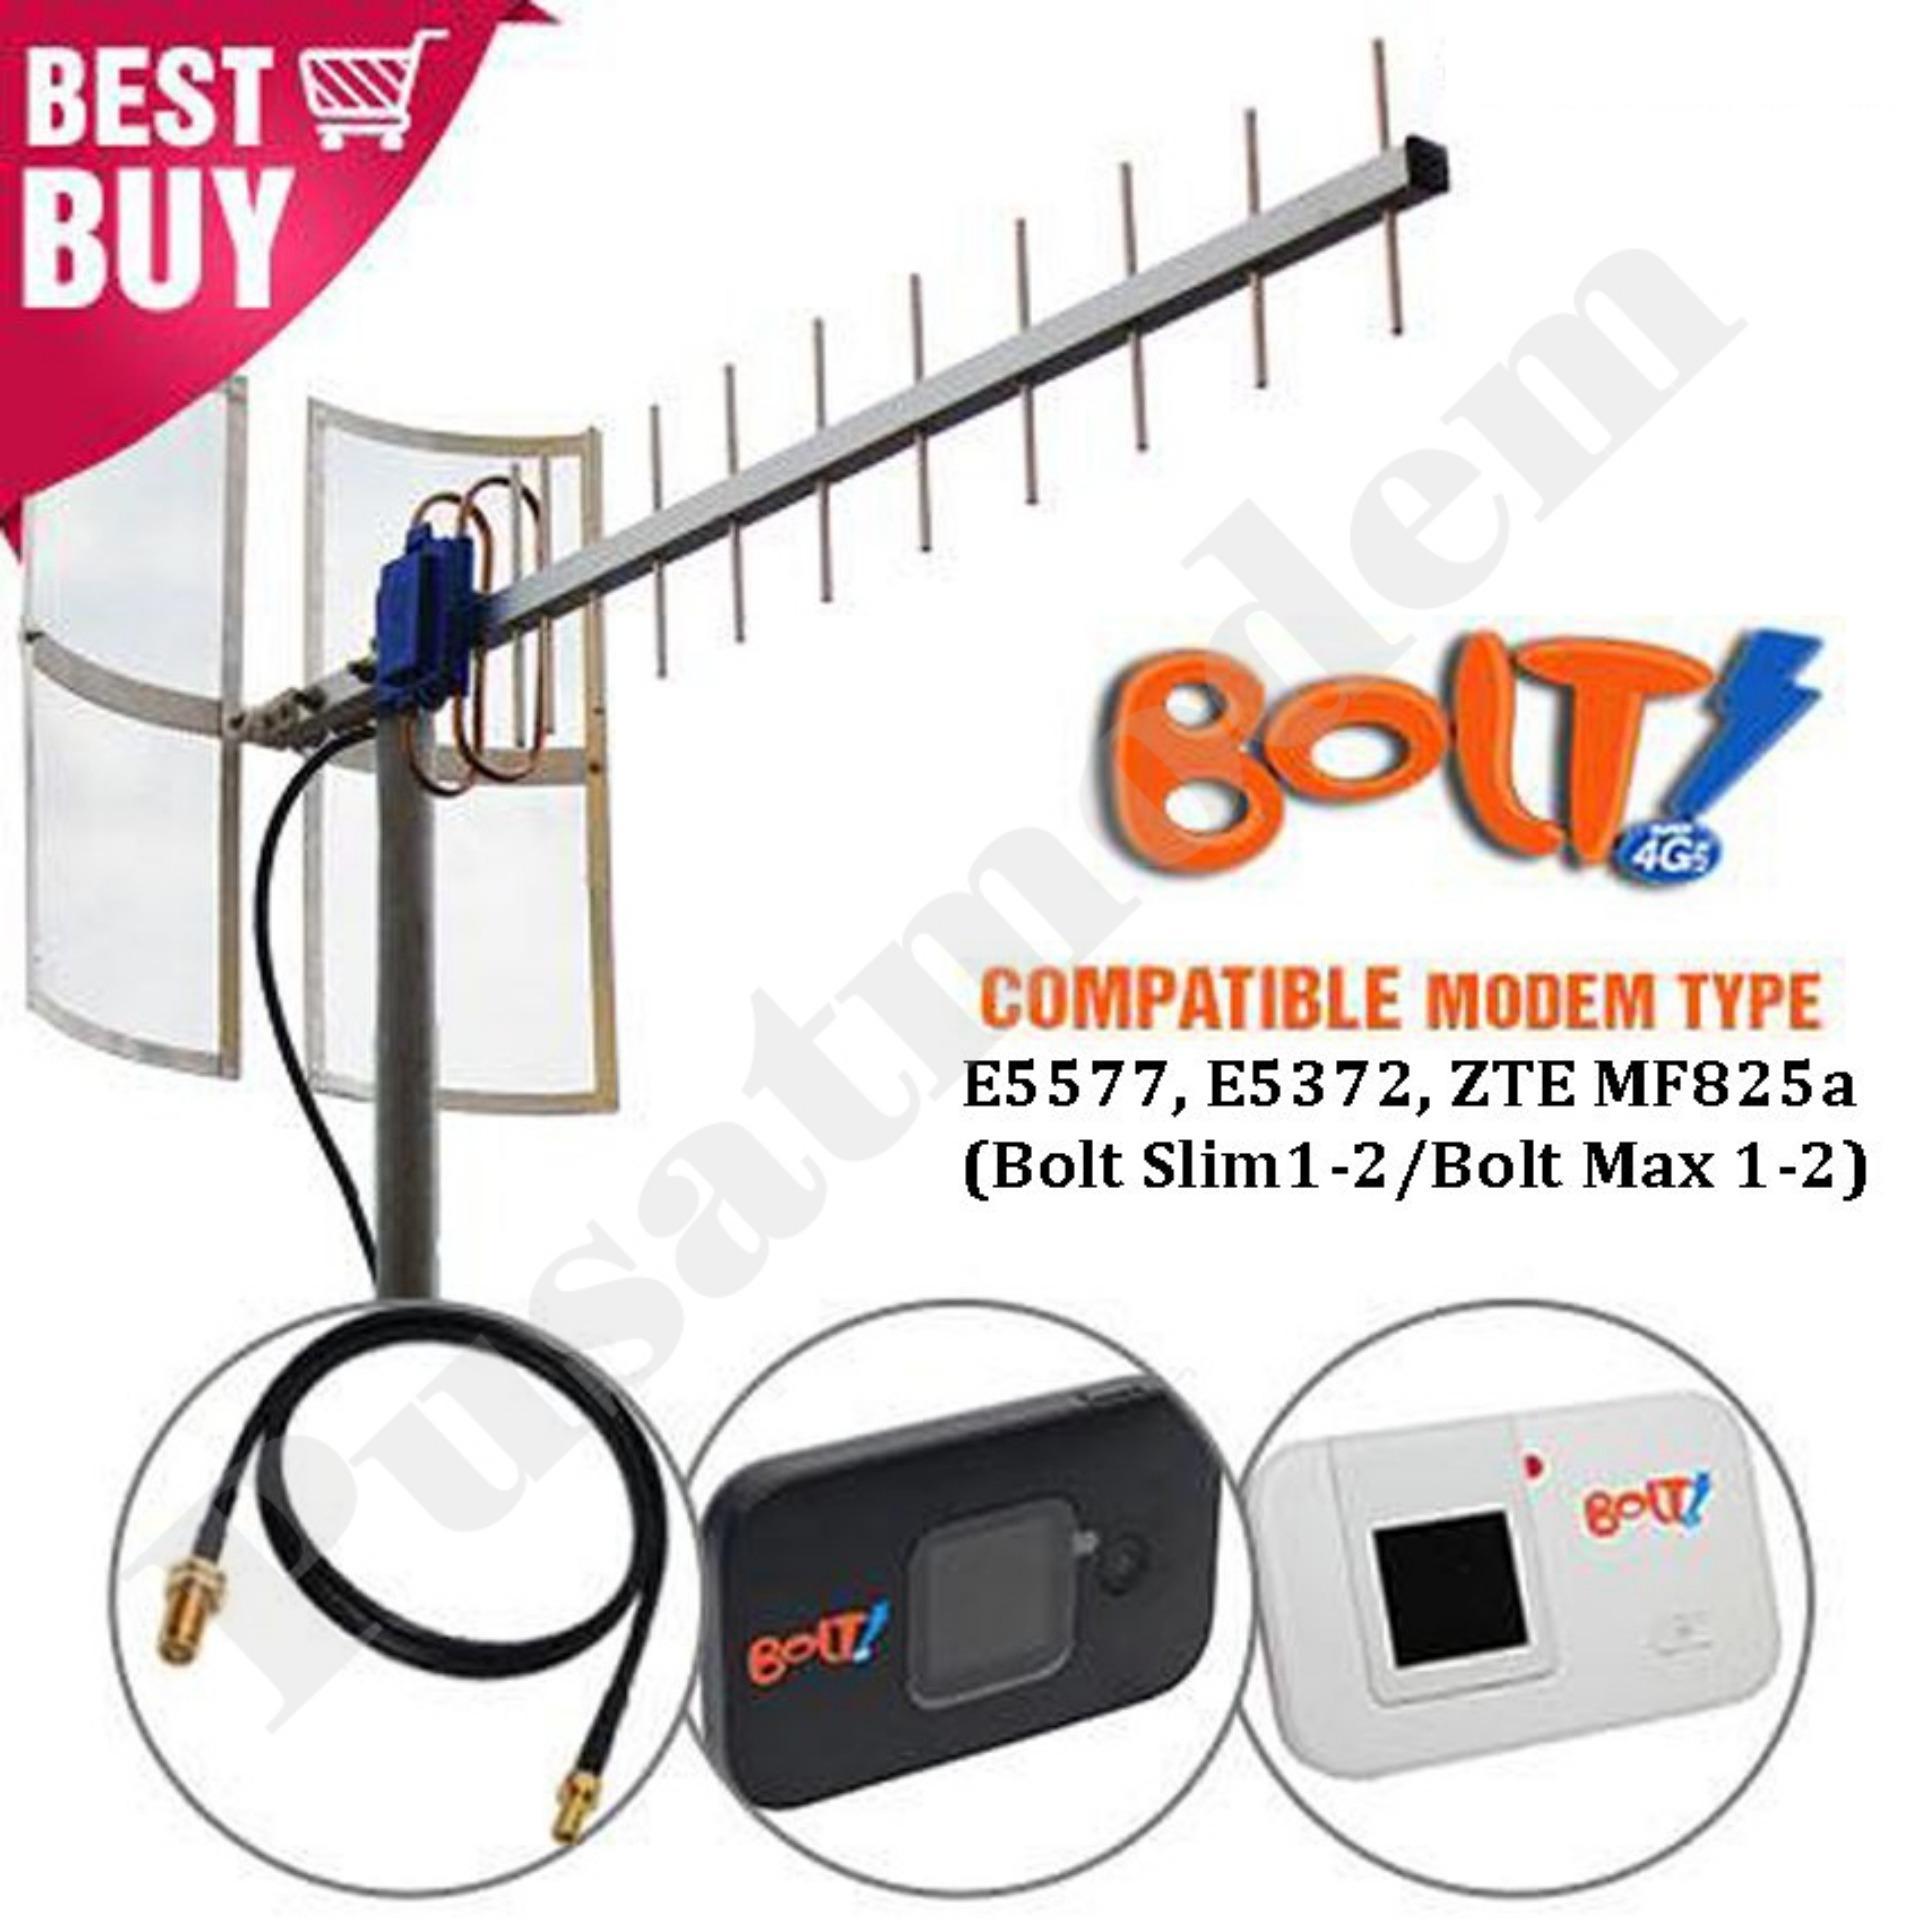 Beli Bolt E5372 Store Marwanto606 Source Antena Modem Slim Dan Max Huawei E5577 With YagiGrid TXR175